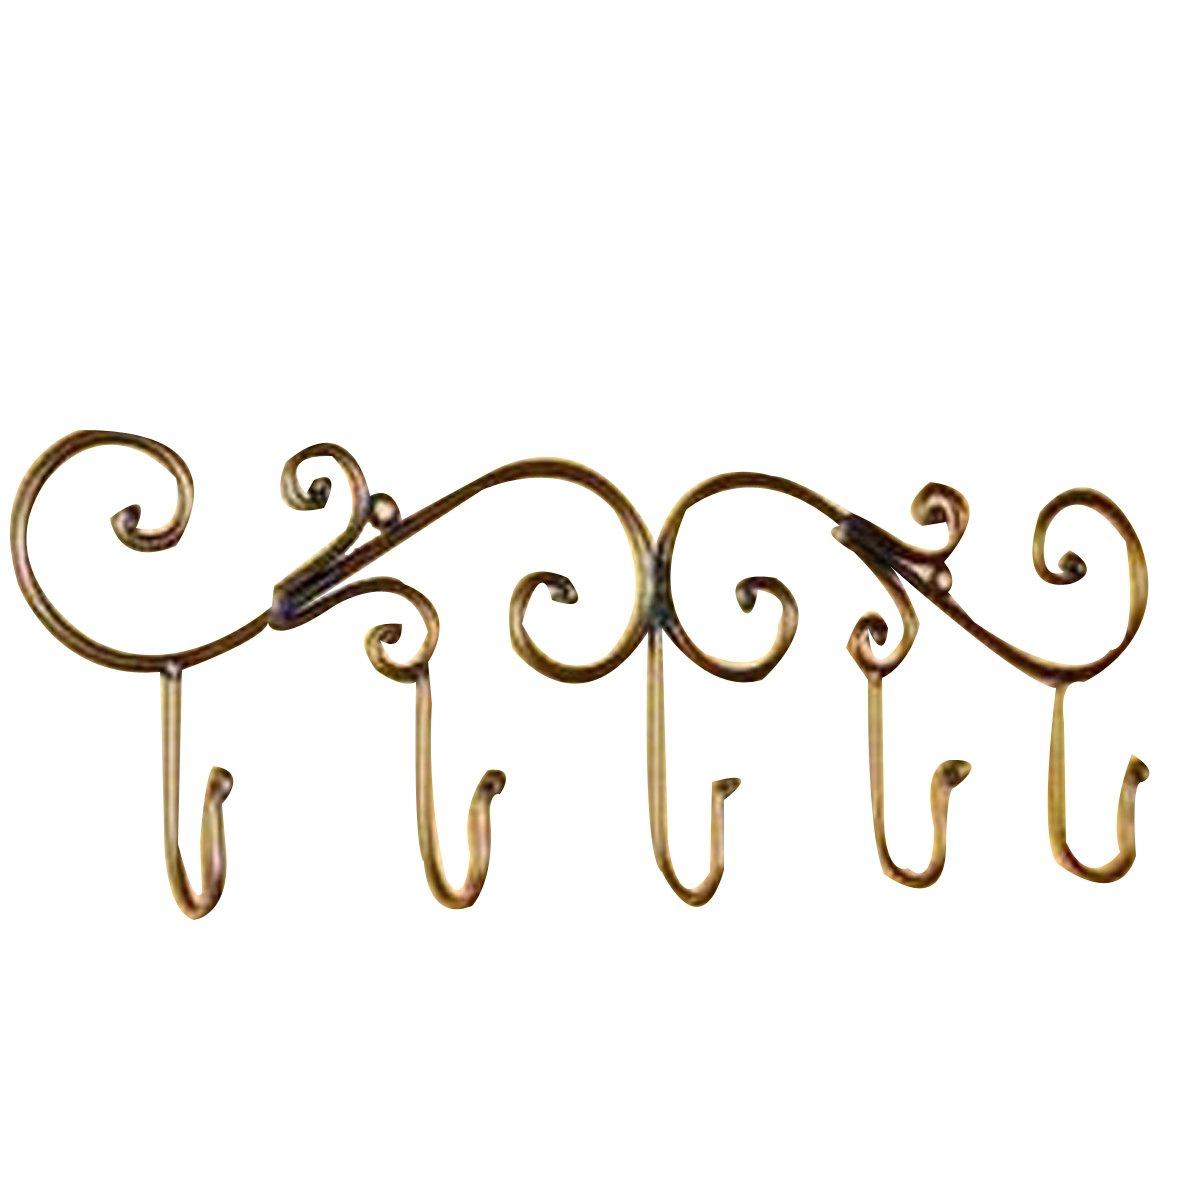 WS @ WX1023 Iron Wall Mount Hooks Hanger Rack (5 Hooks),Bronze 60%OFF